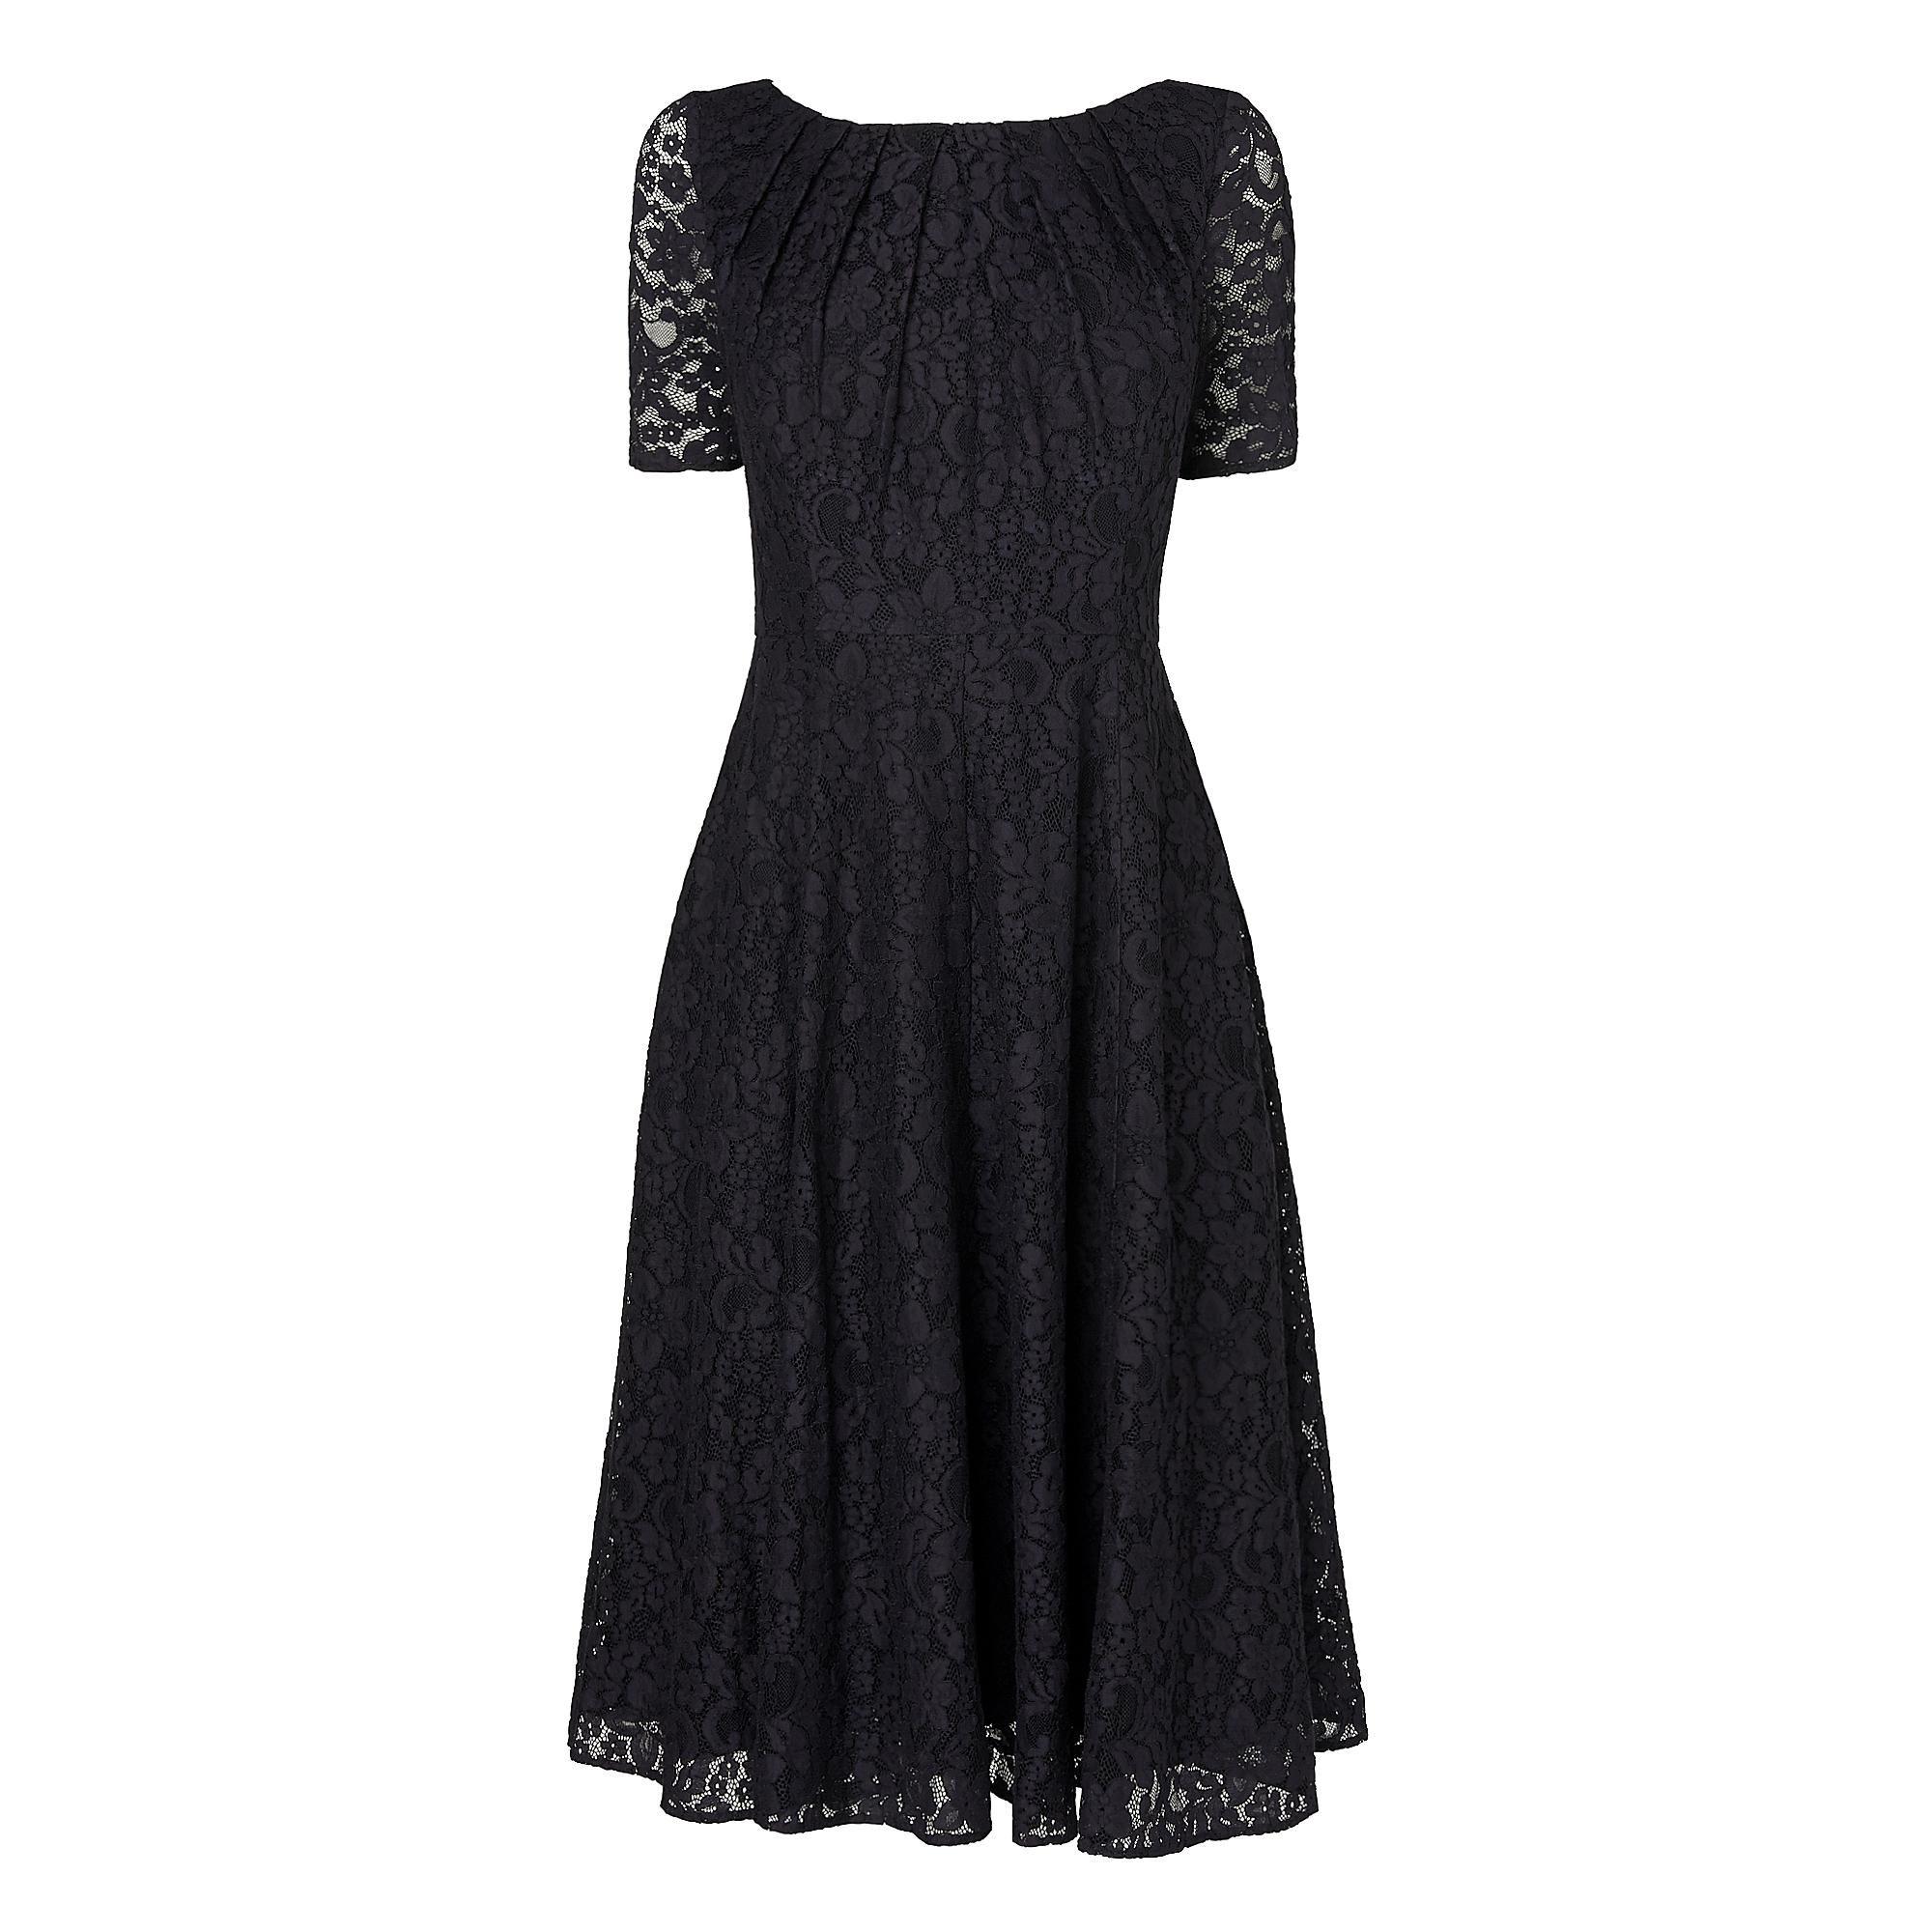 Celine Lace Dress  Dresses  Clothing  Collections  LKBennett